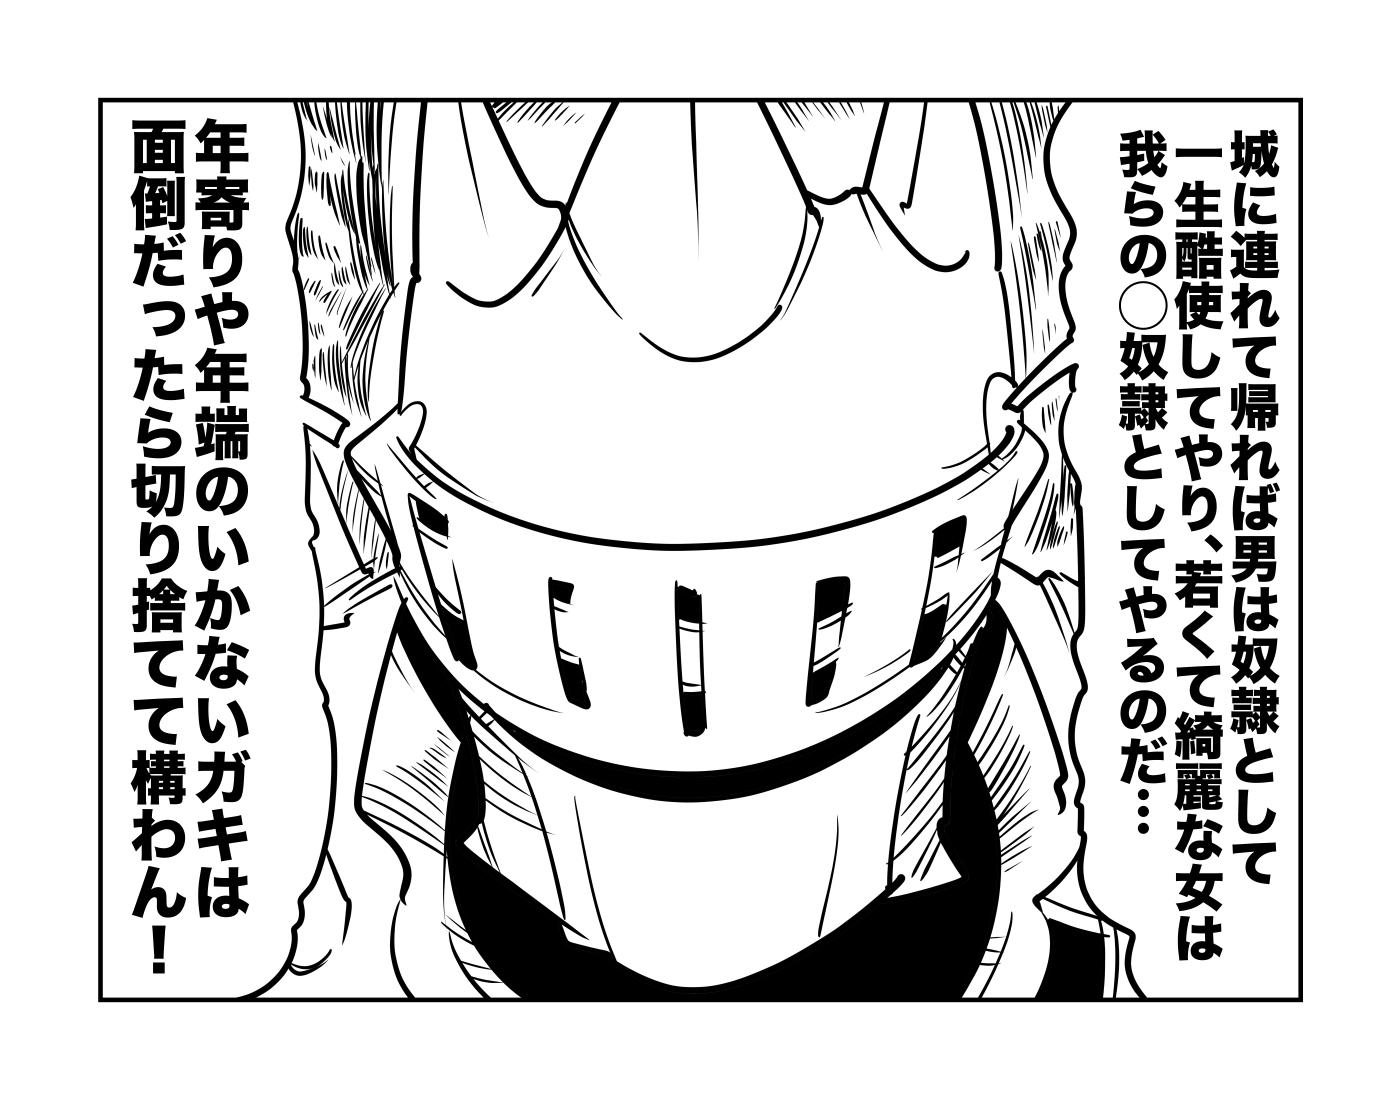 f:id:terashimaru117:20210914221934p:plain